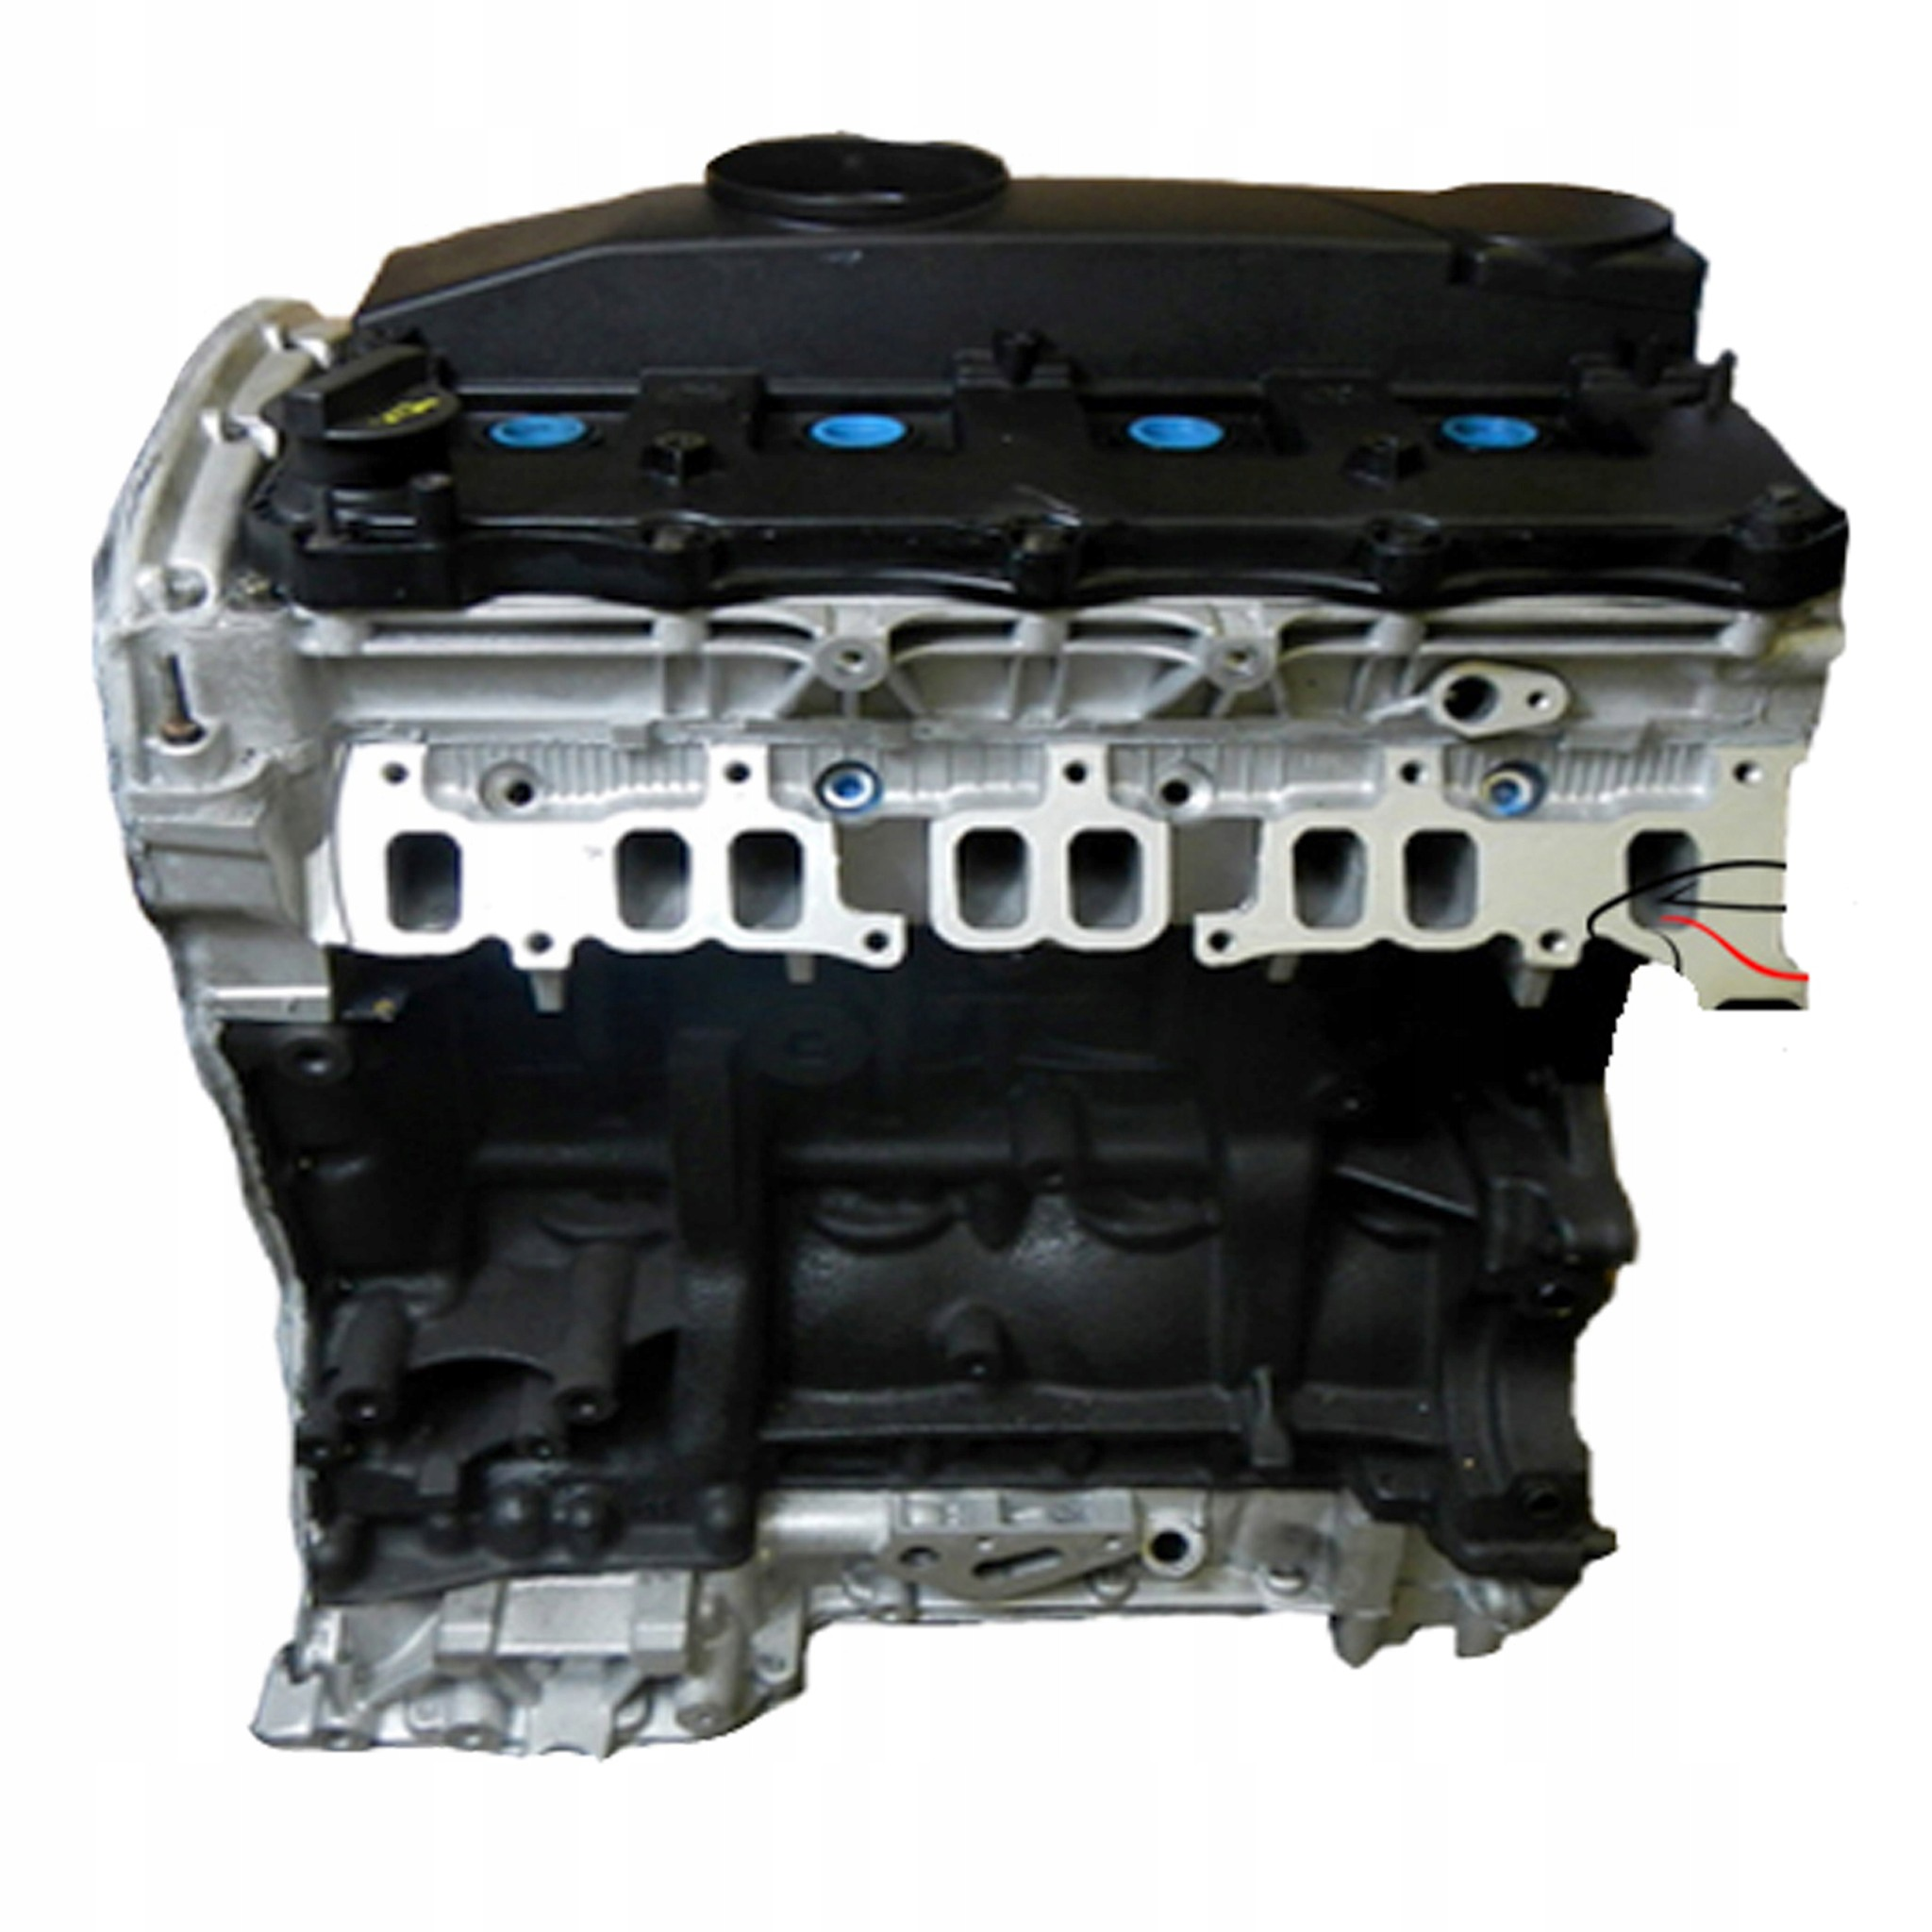 ford transit 24 tdci h9fb двигатель motor engine 140